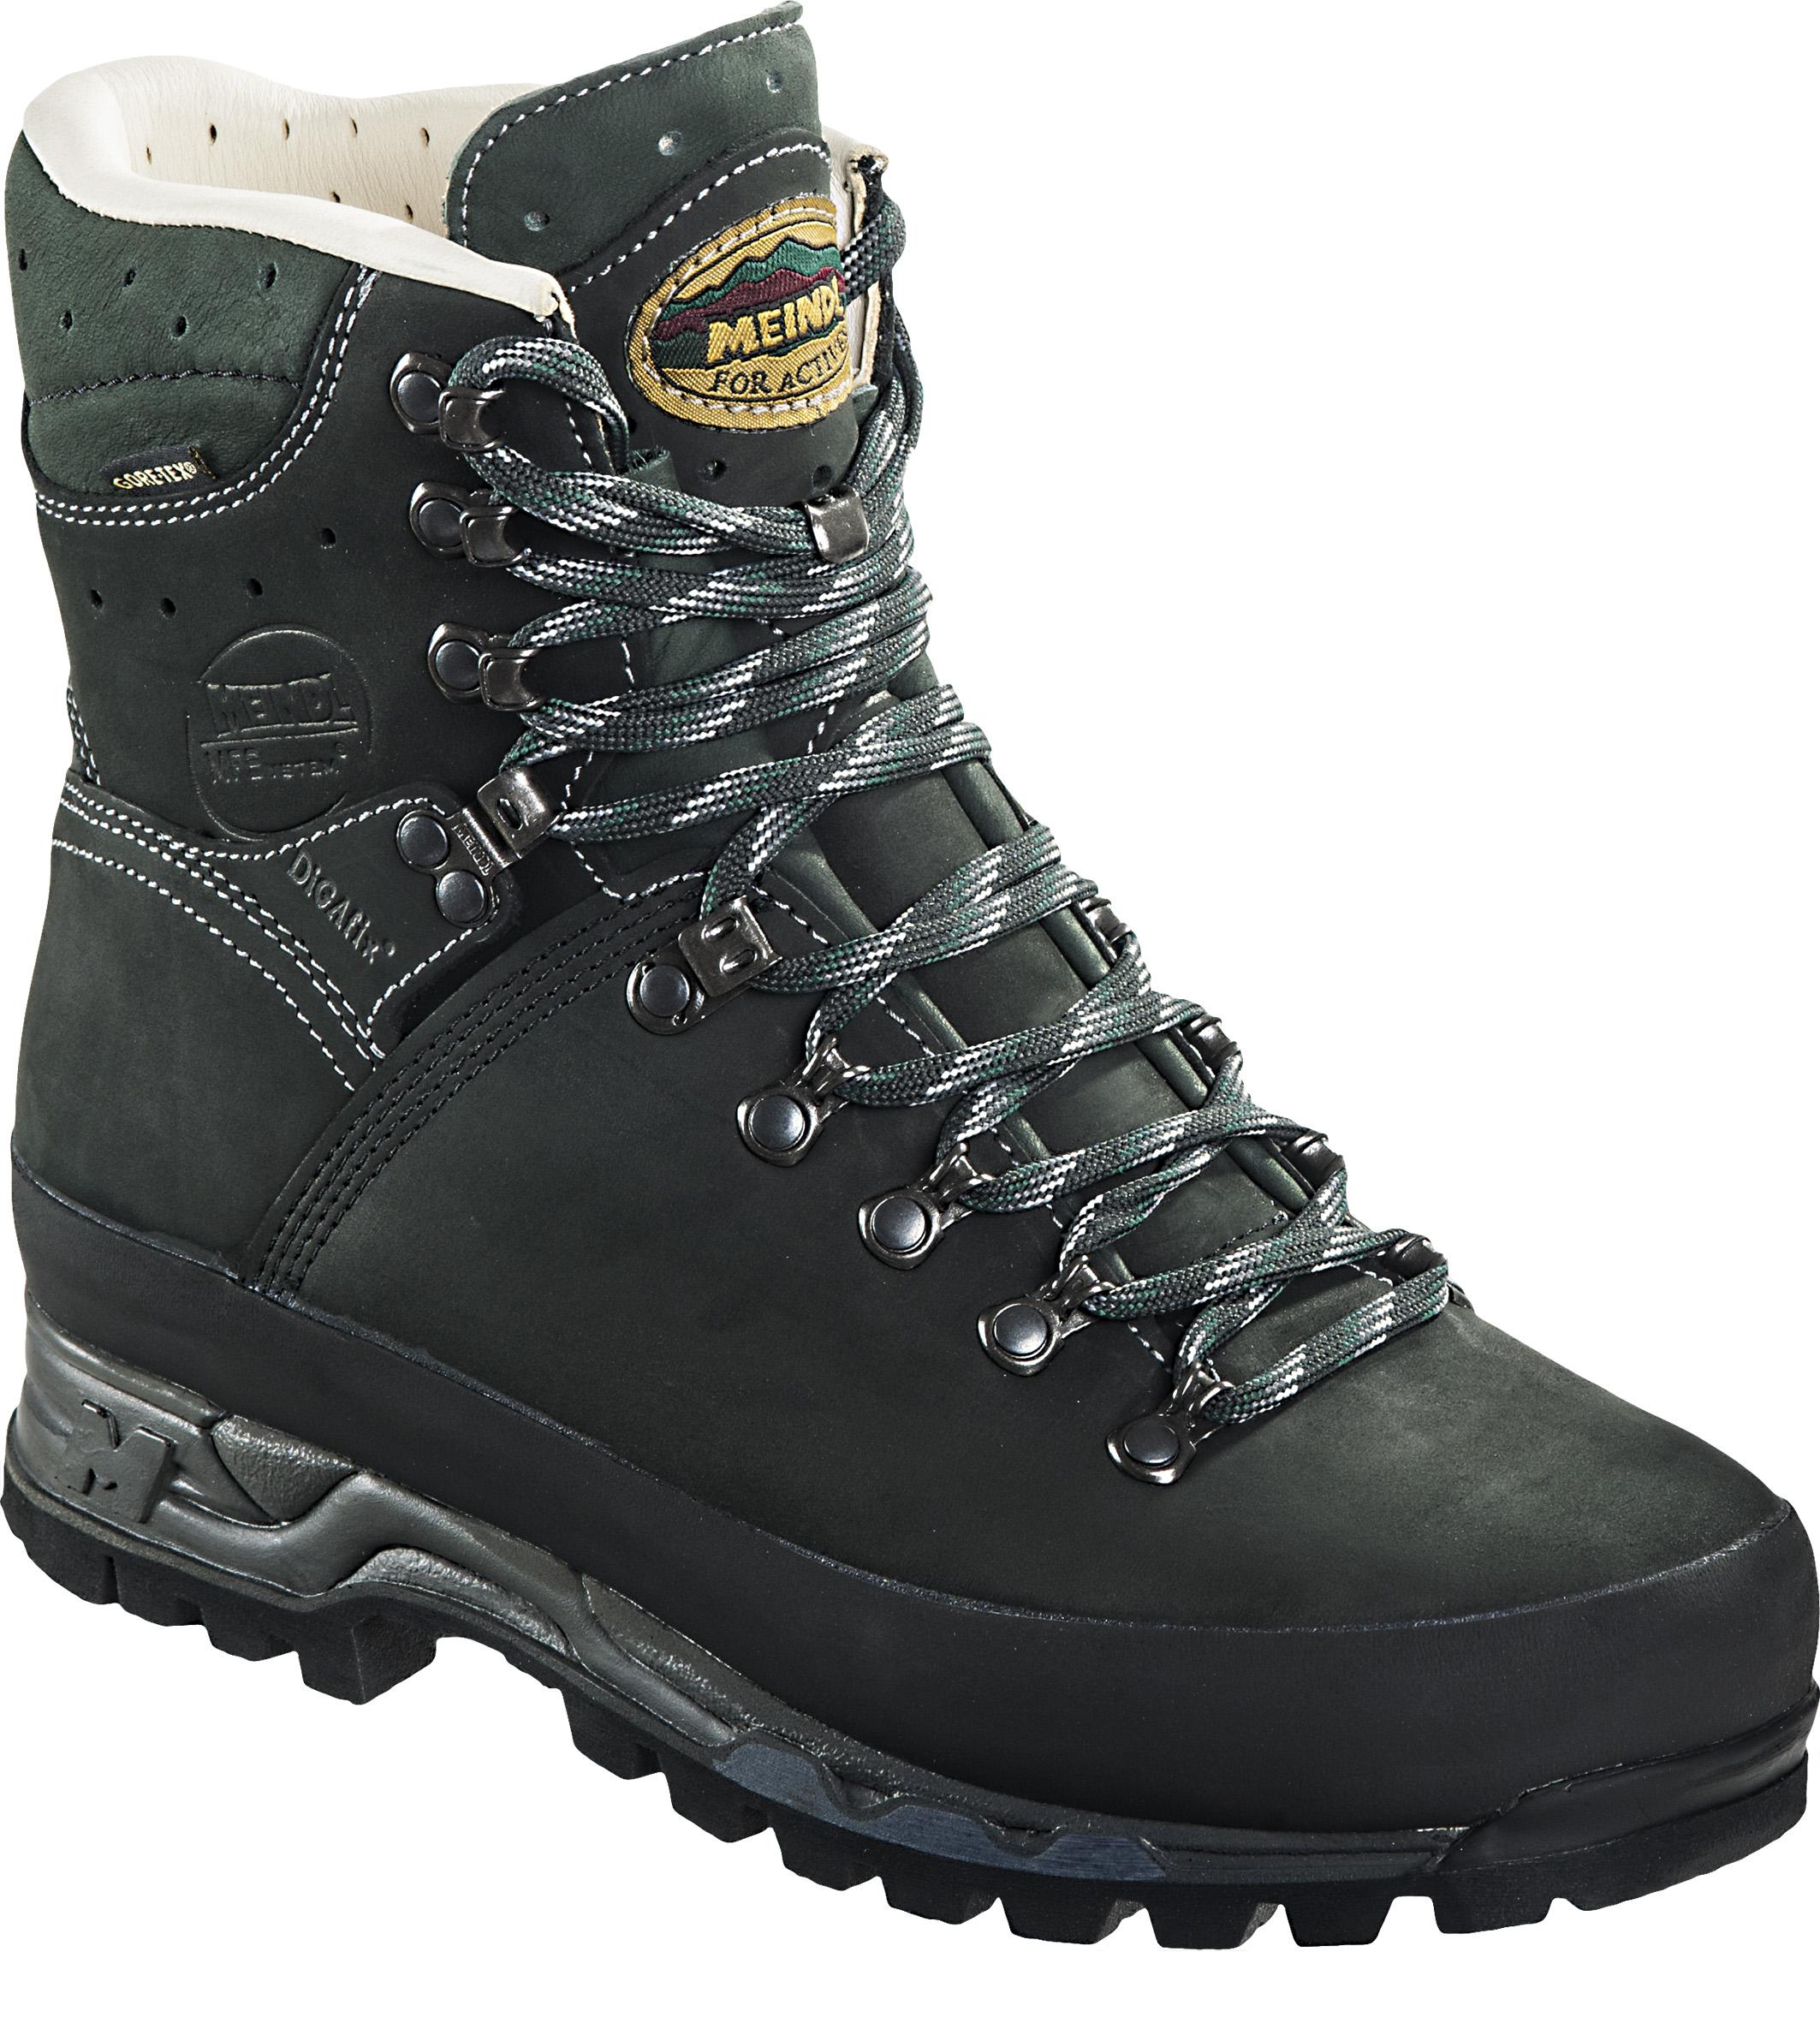 Meindl - Island MFS Active - Hiking Boots - Men's